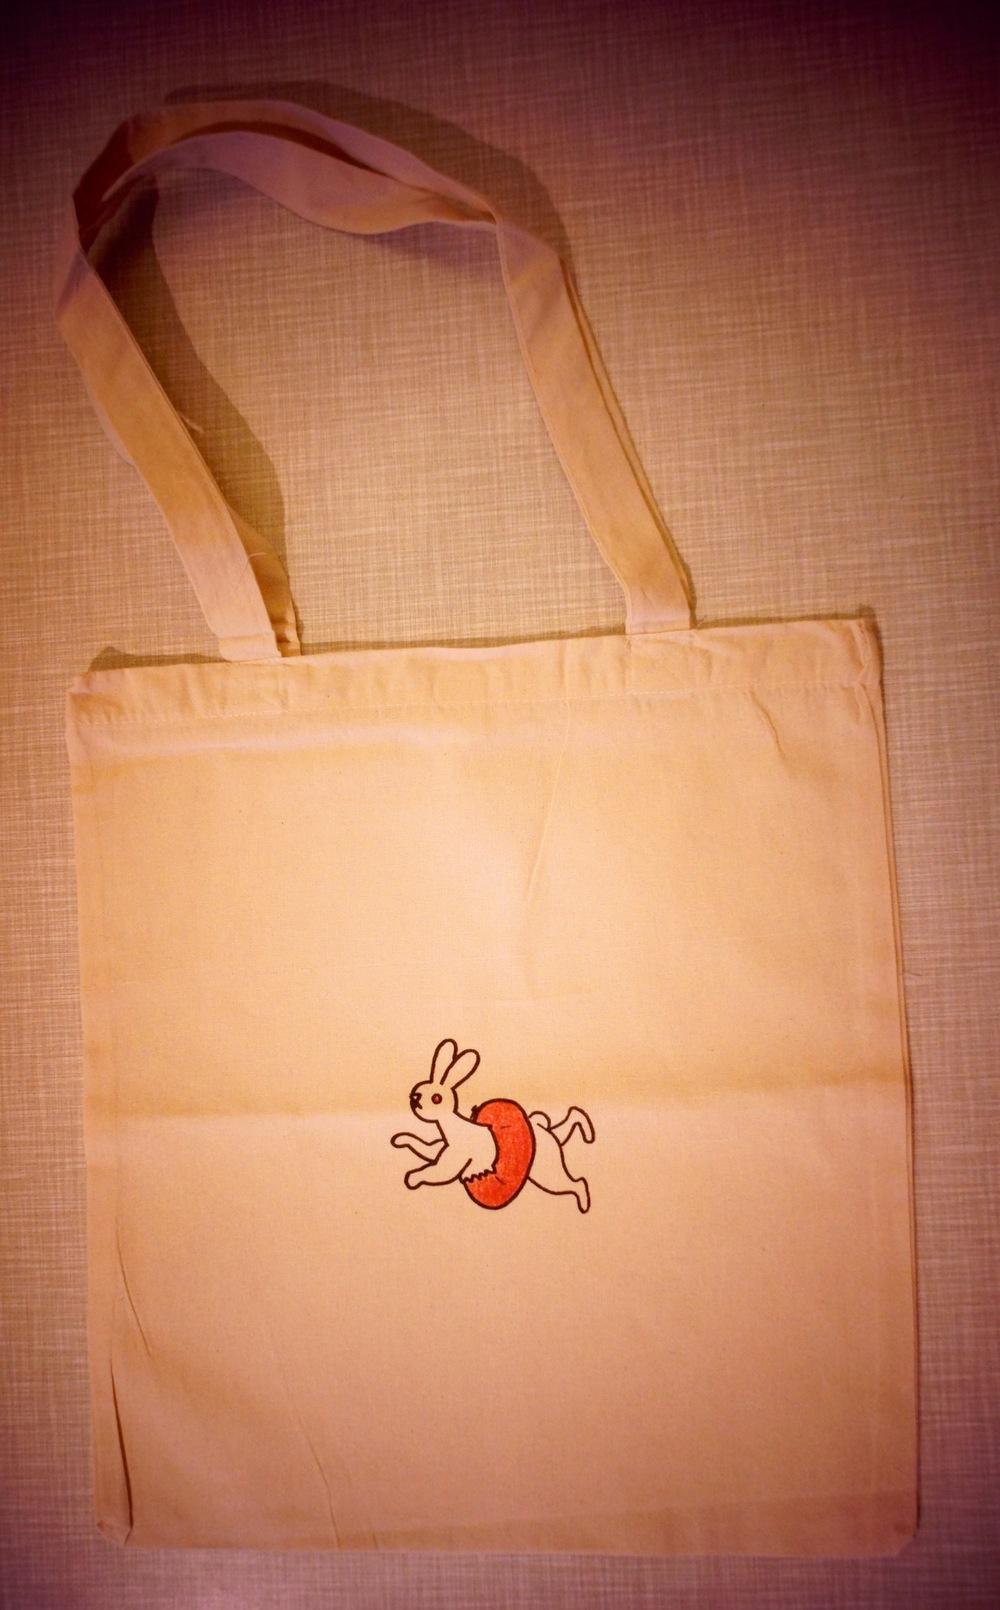 Its a nice swimming bag.